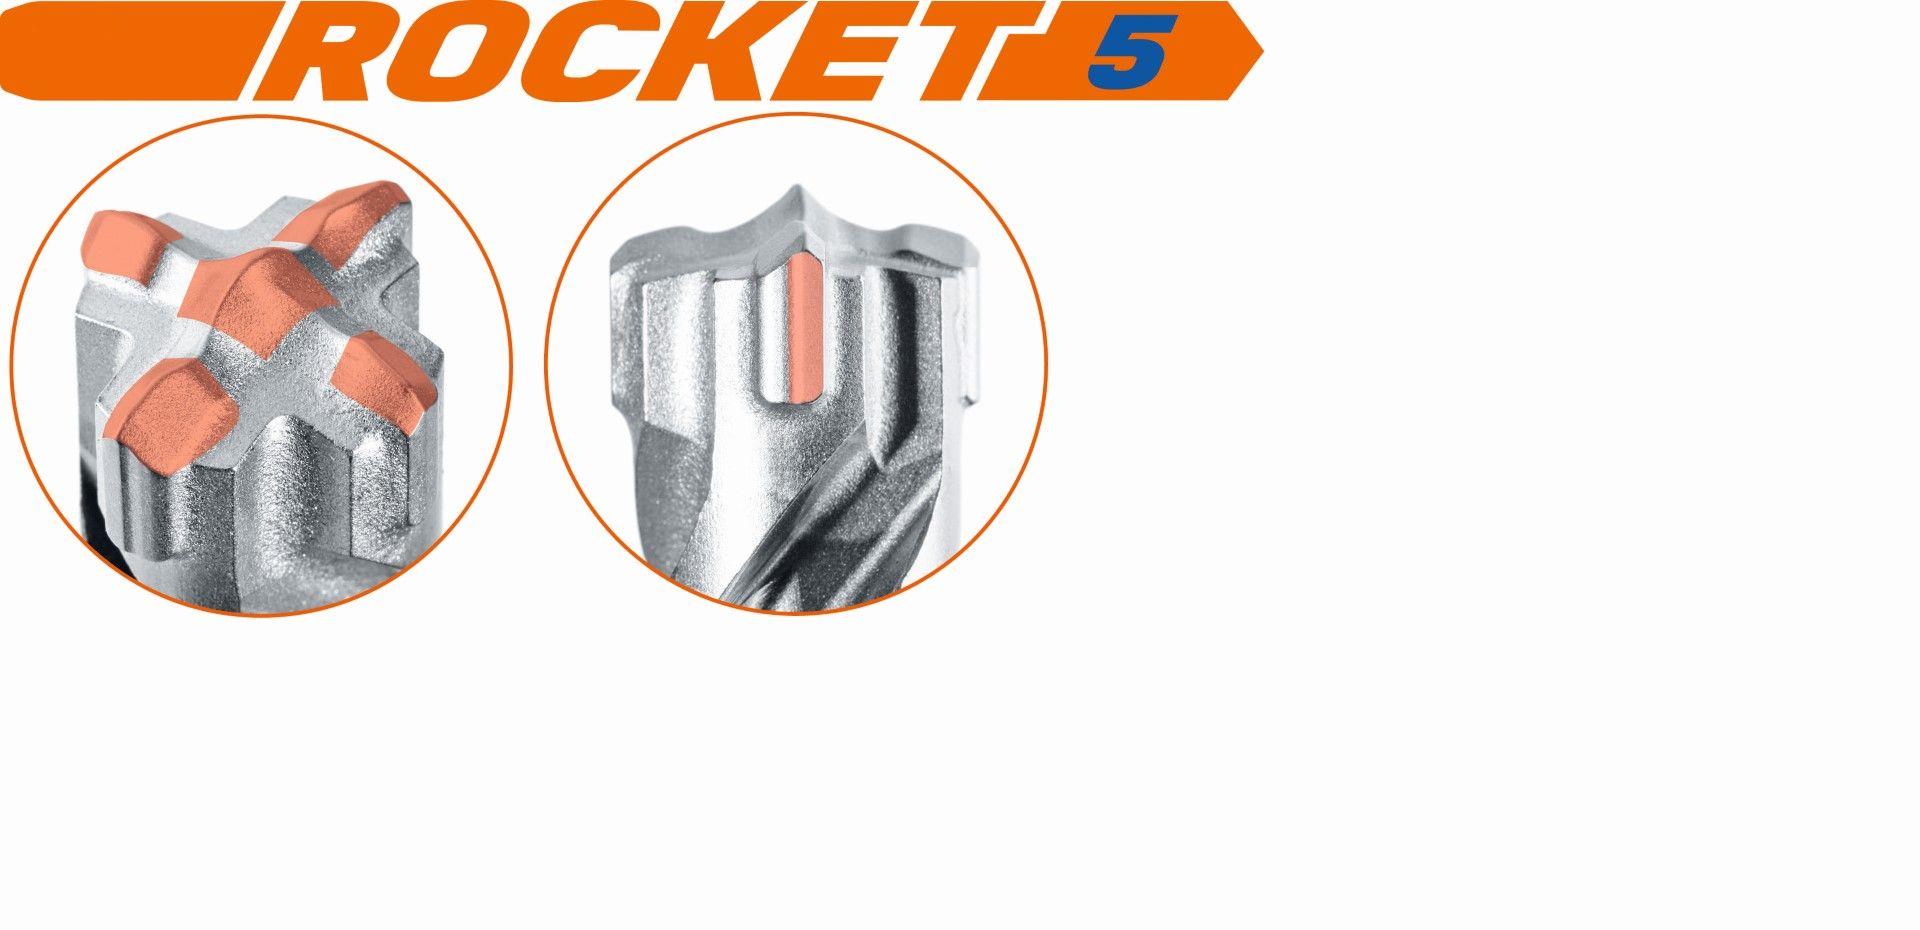 Slika BORER Rocket 5 SDS-plus 6,5x260 mm 4 kraka